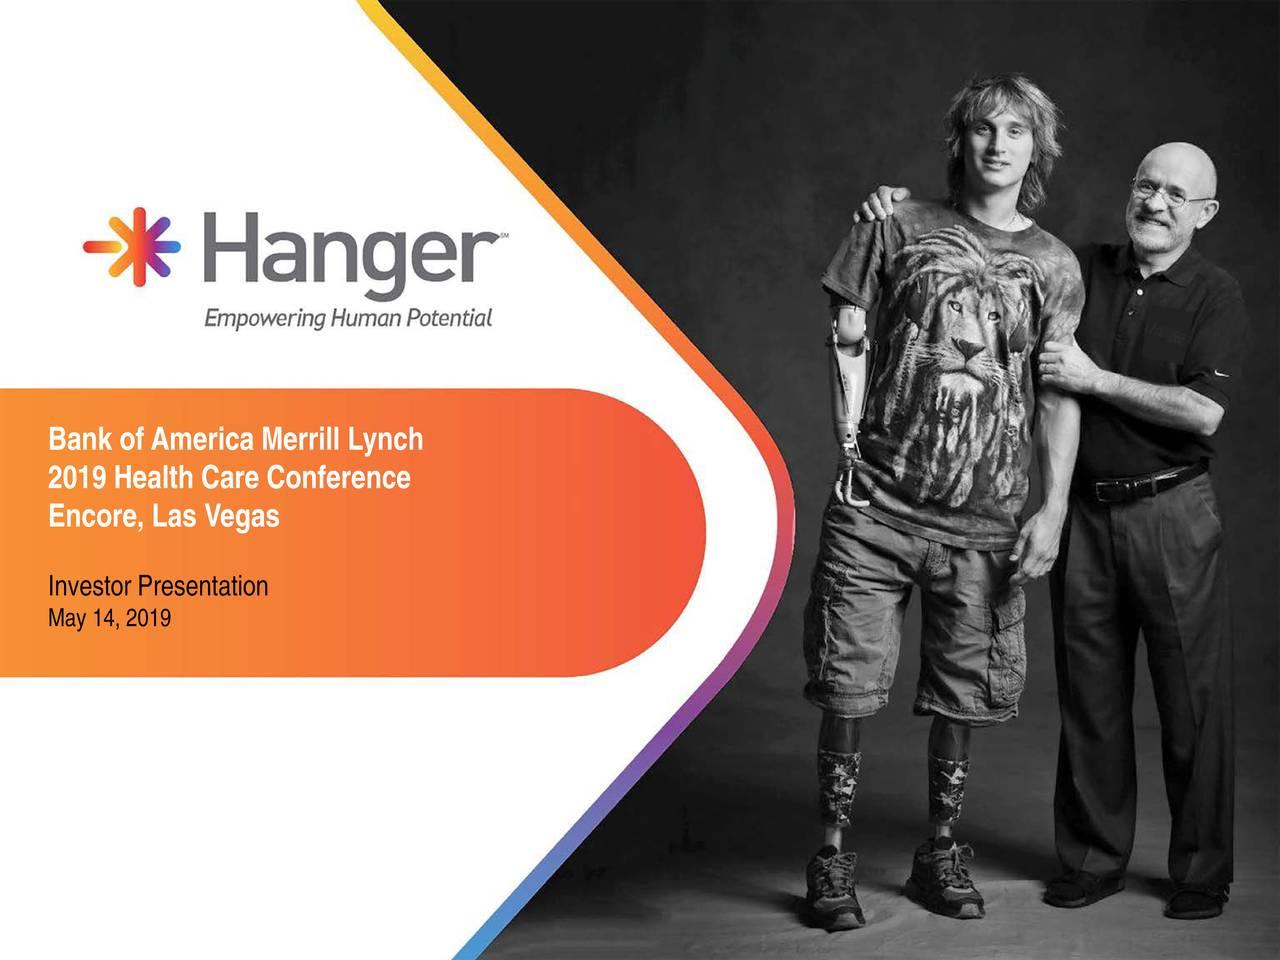 Hanger (HNGR) Presents At BAML 2019 Health Care Conference - Slideshow